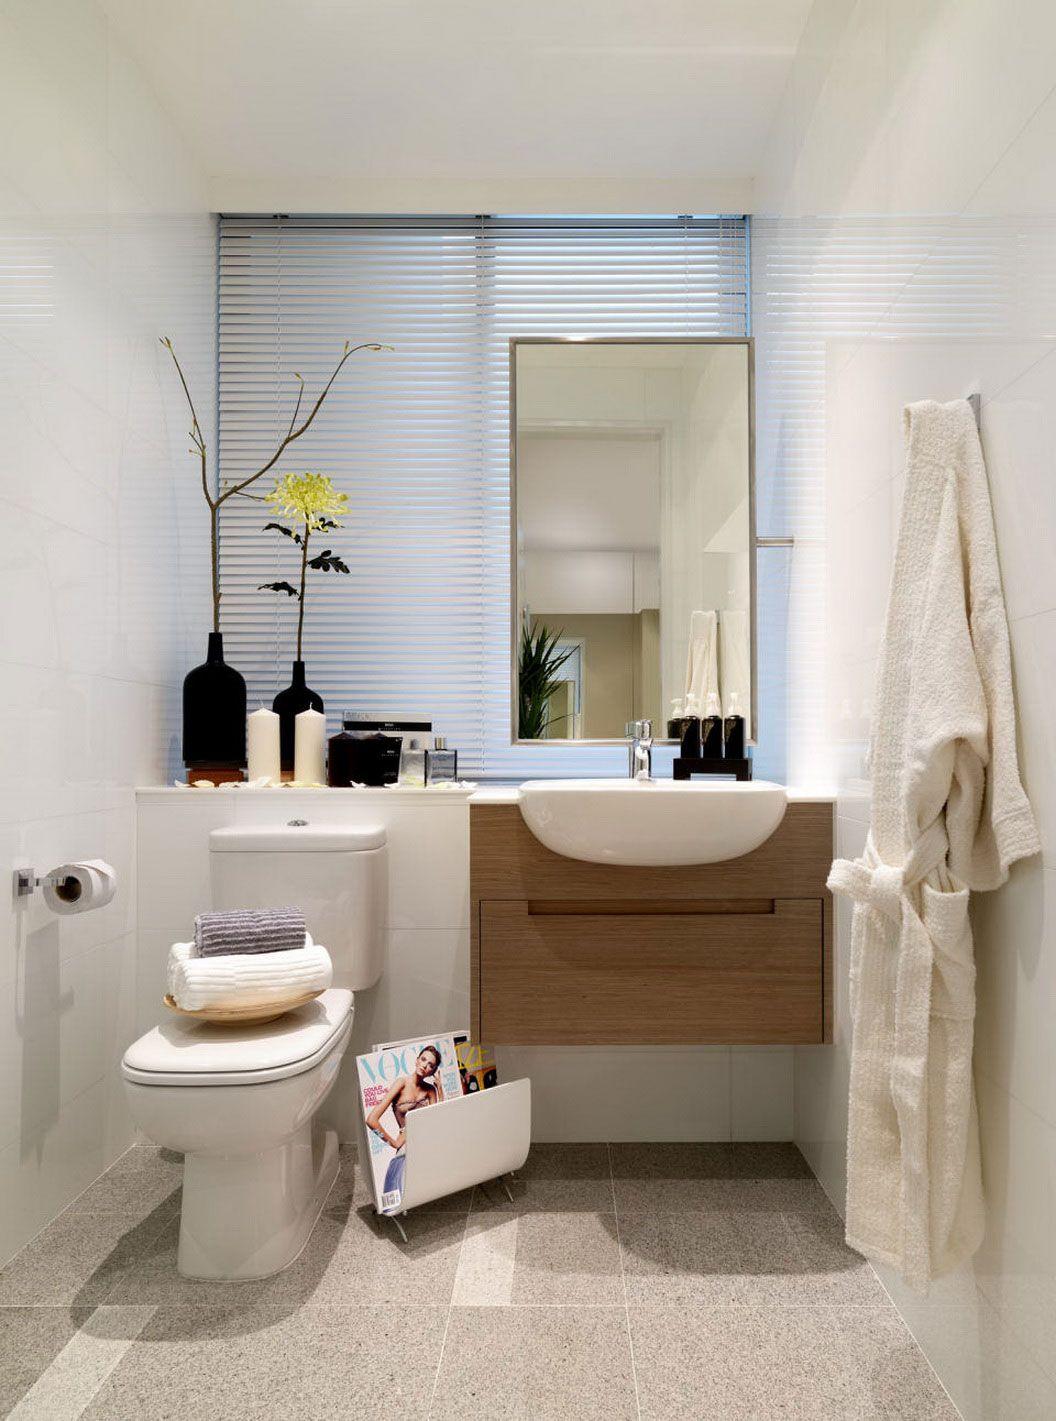 Bathroom Fabulous Beautiful Modern Small Bathroom Layouts Bathroom Design Small Small Bathroom Layout Contemporary Bathroom Designs Latest small bathroom design